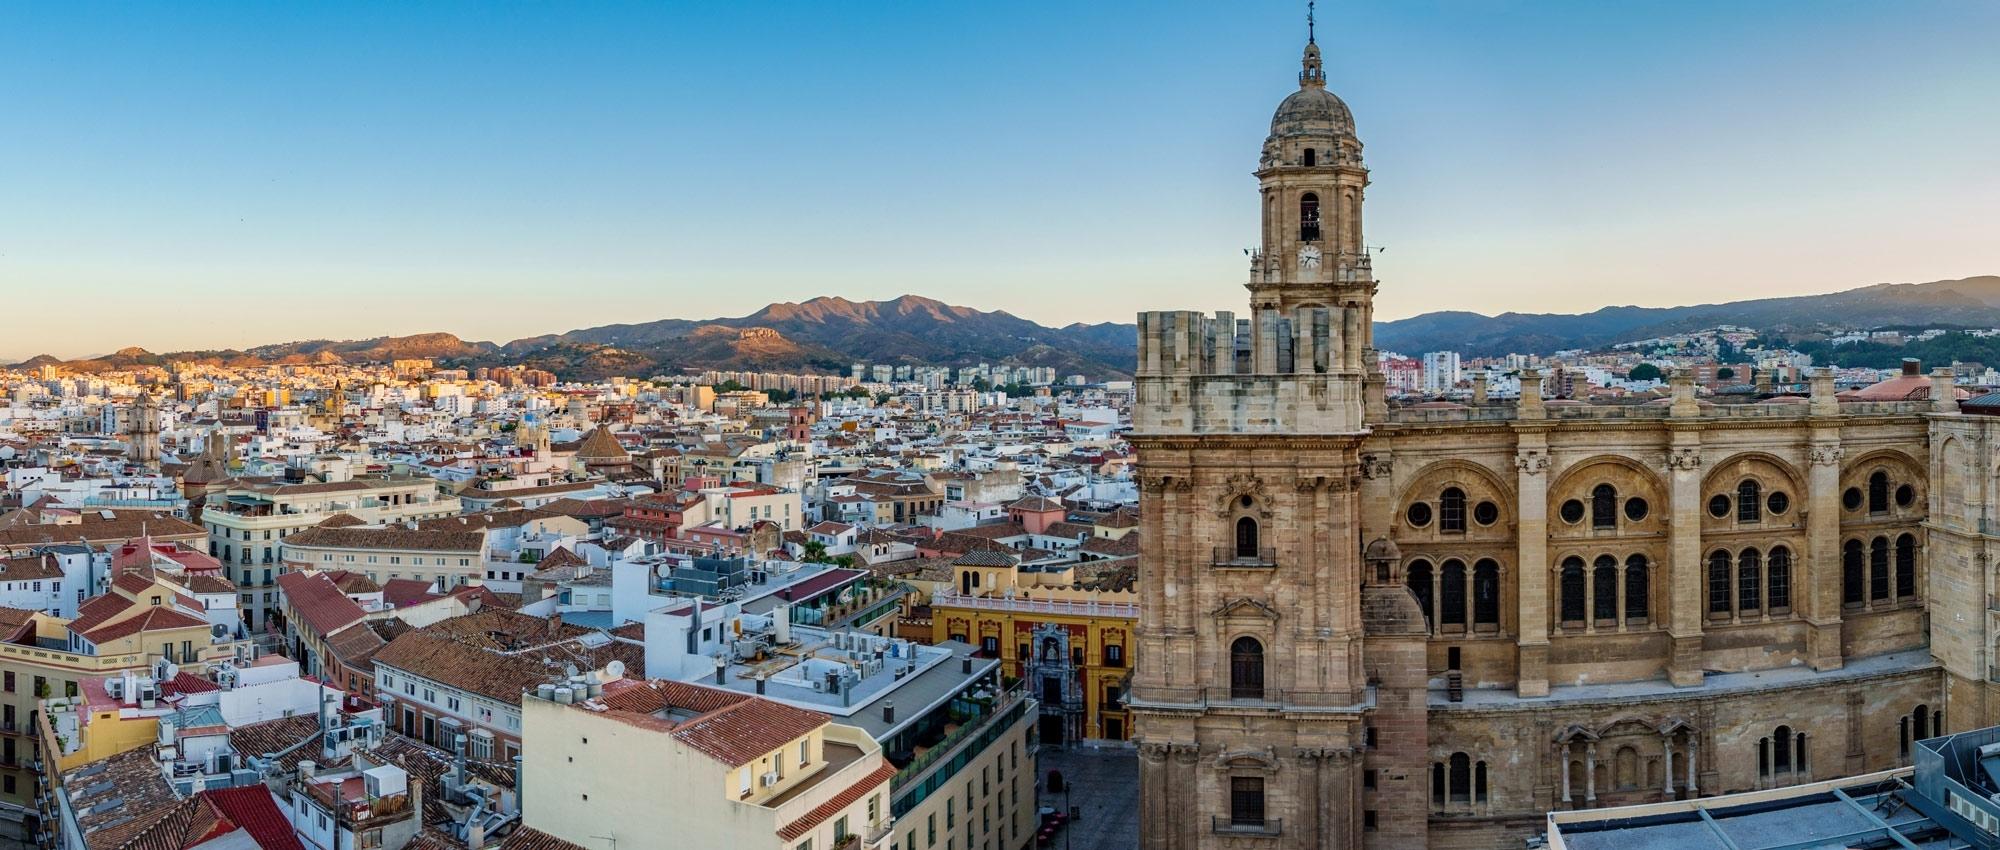 Rent a Convertible in Malaga